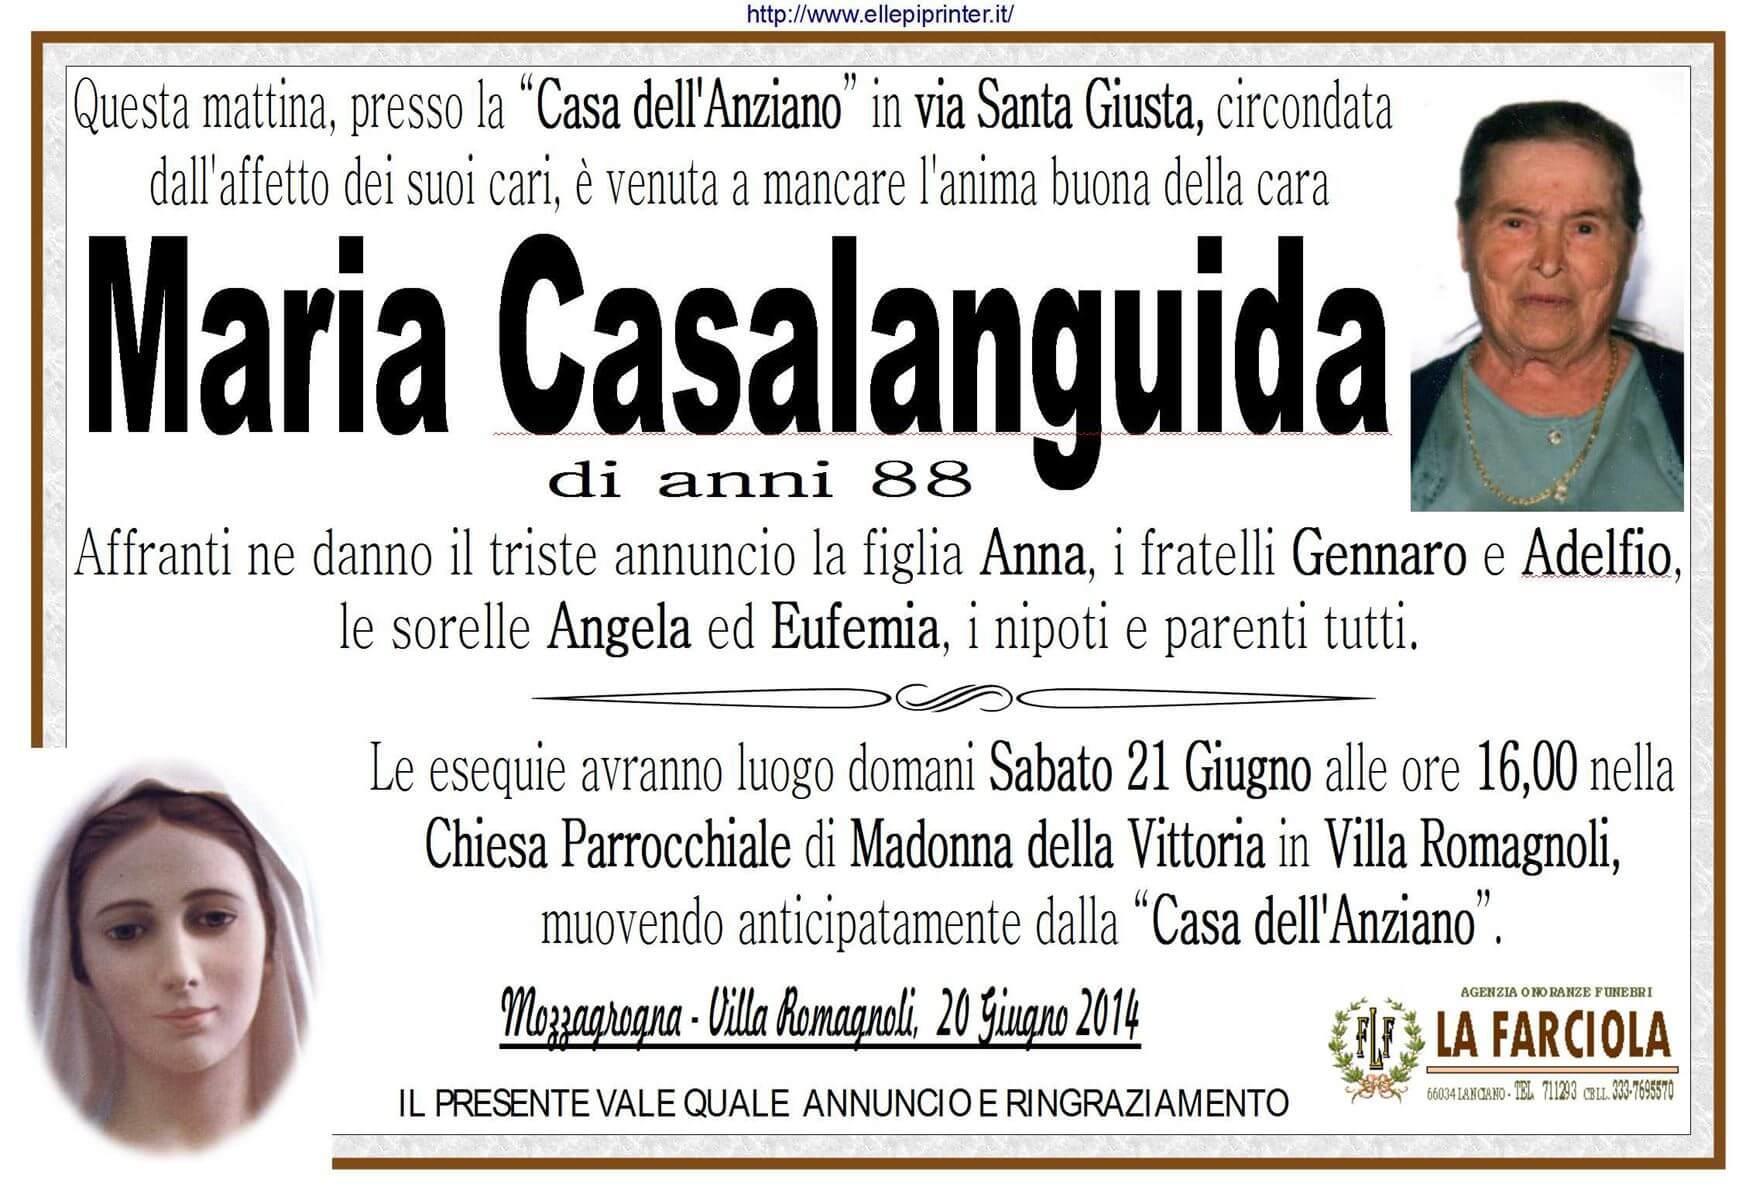 Onoranze Funebri La Farciola & Sigismondi - MARIA CASALANGUIDA